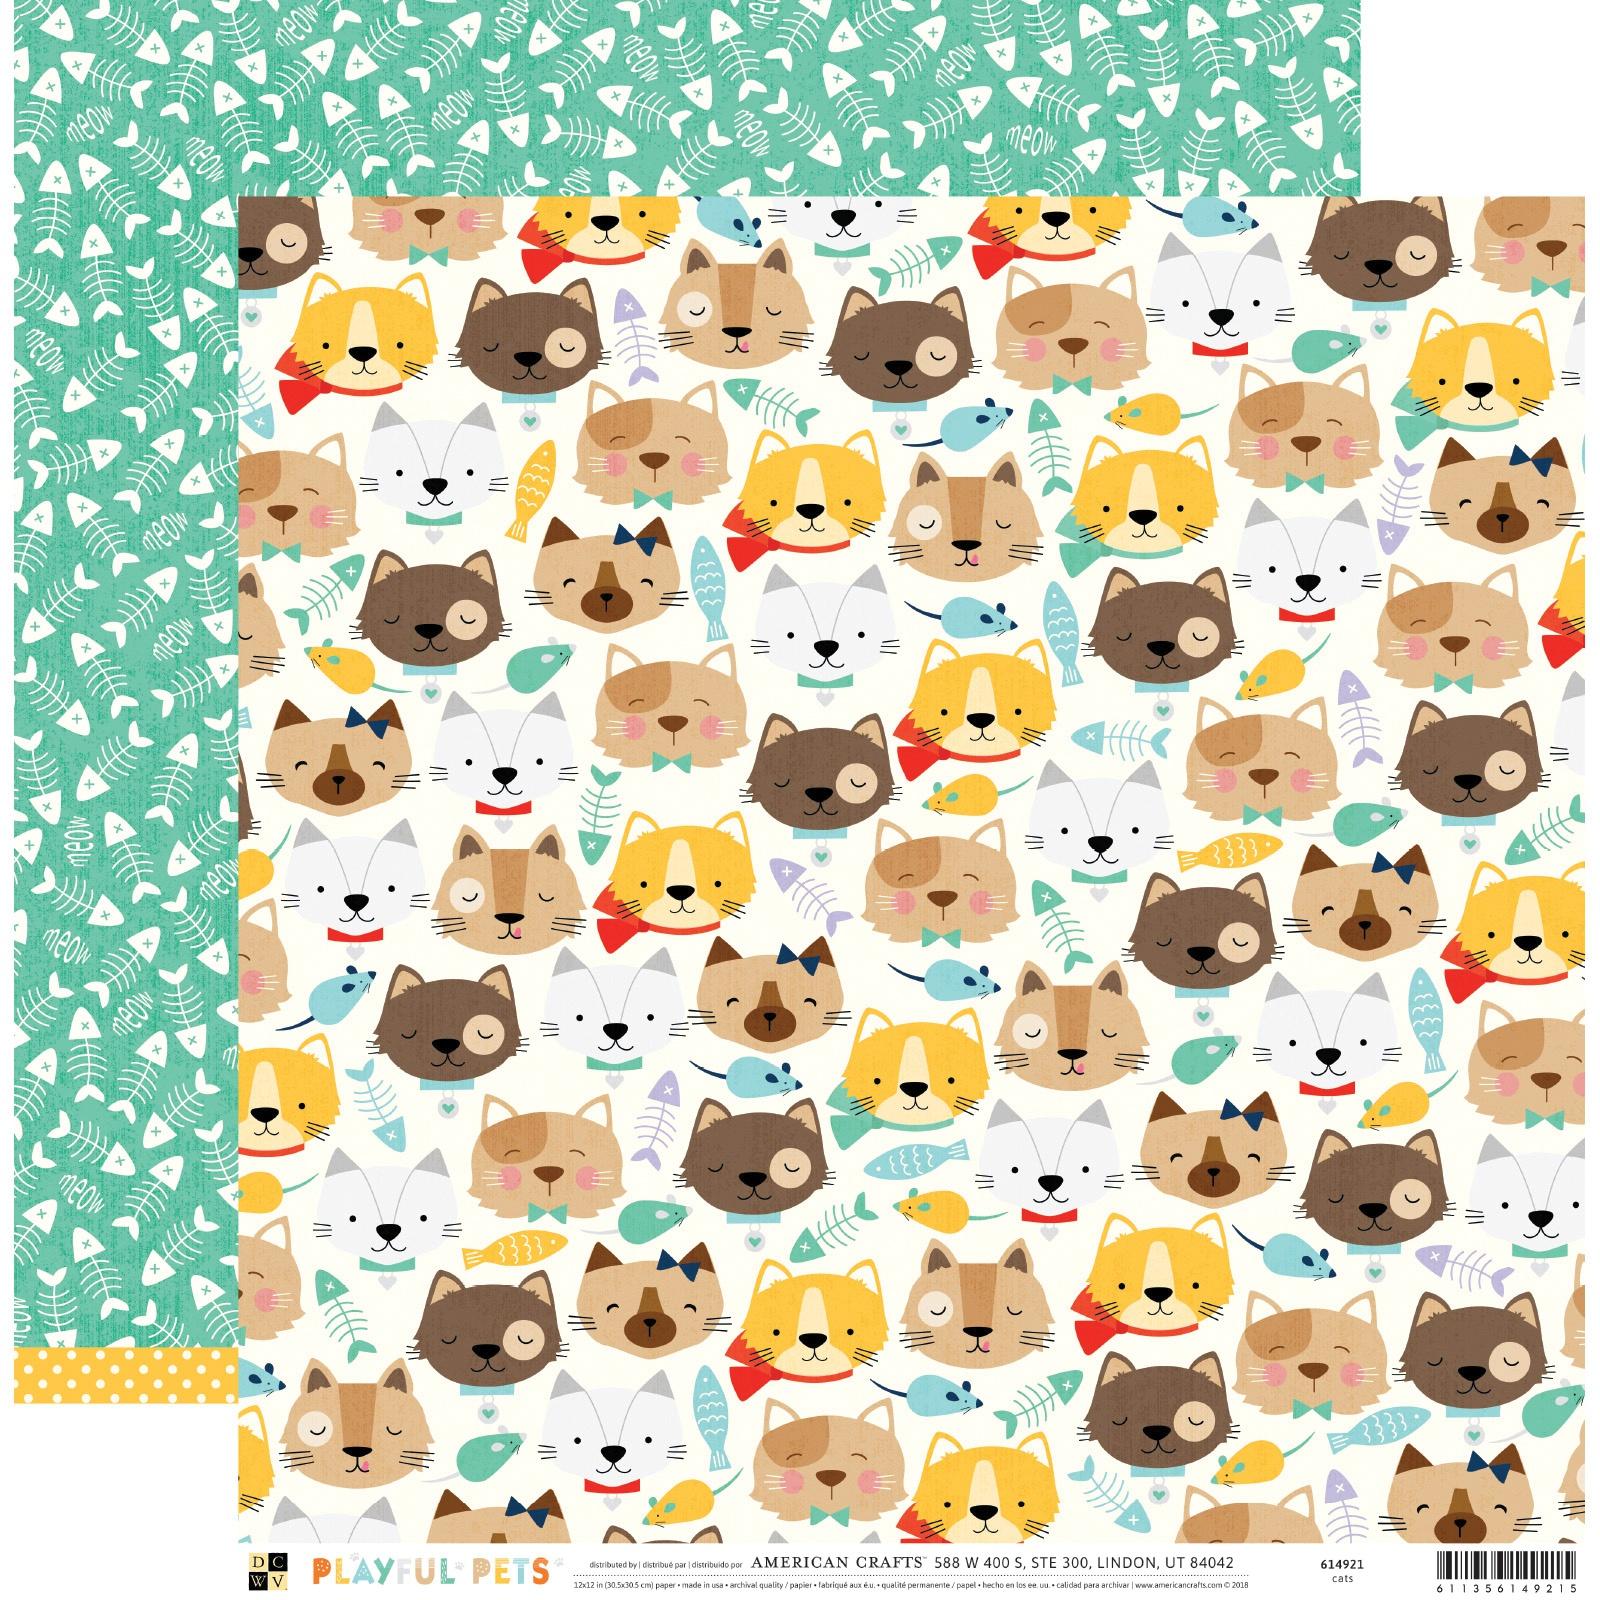 DCWV Playful Pets - Cats